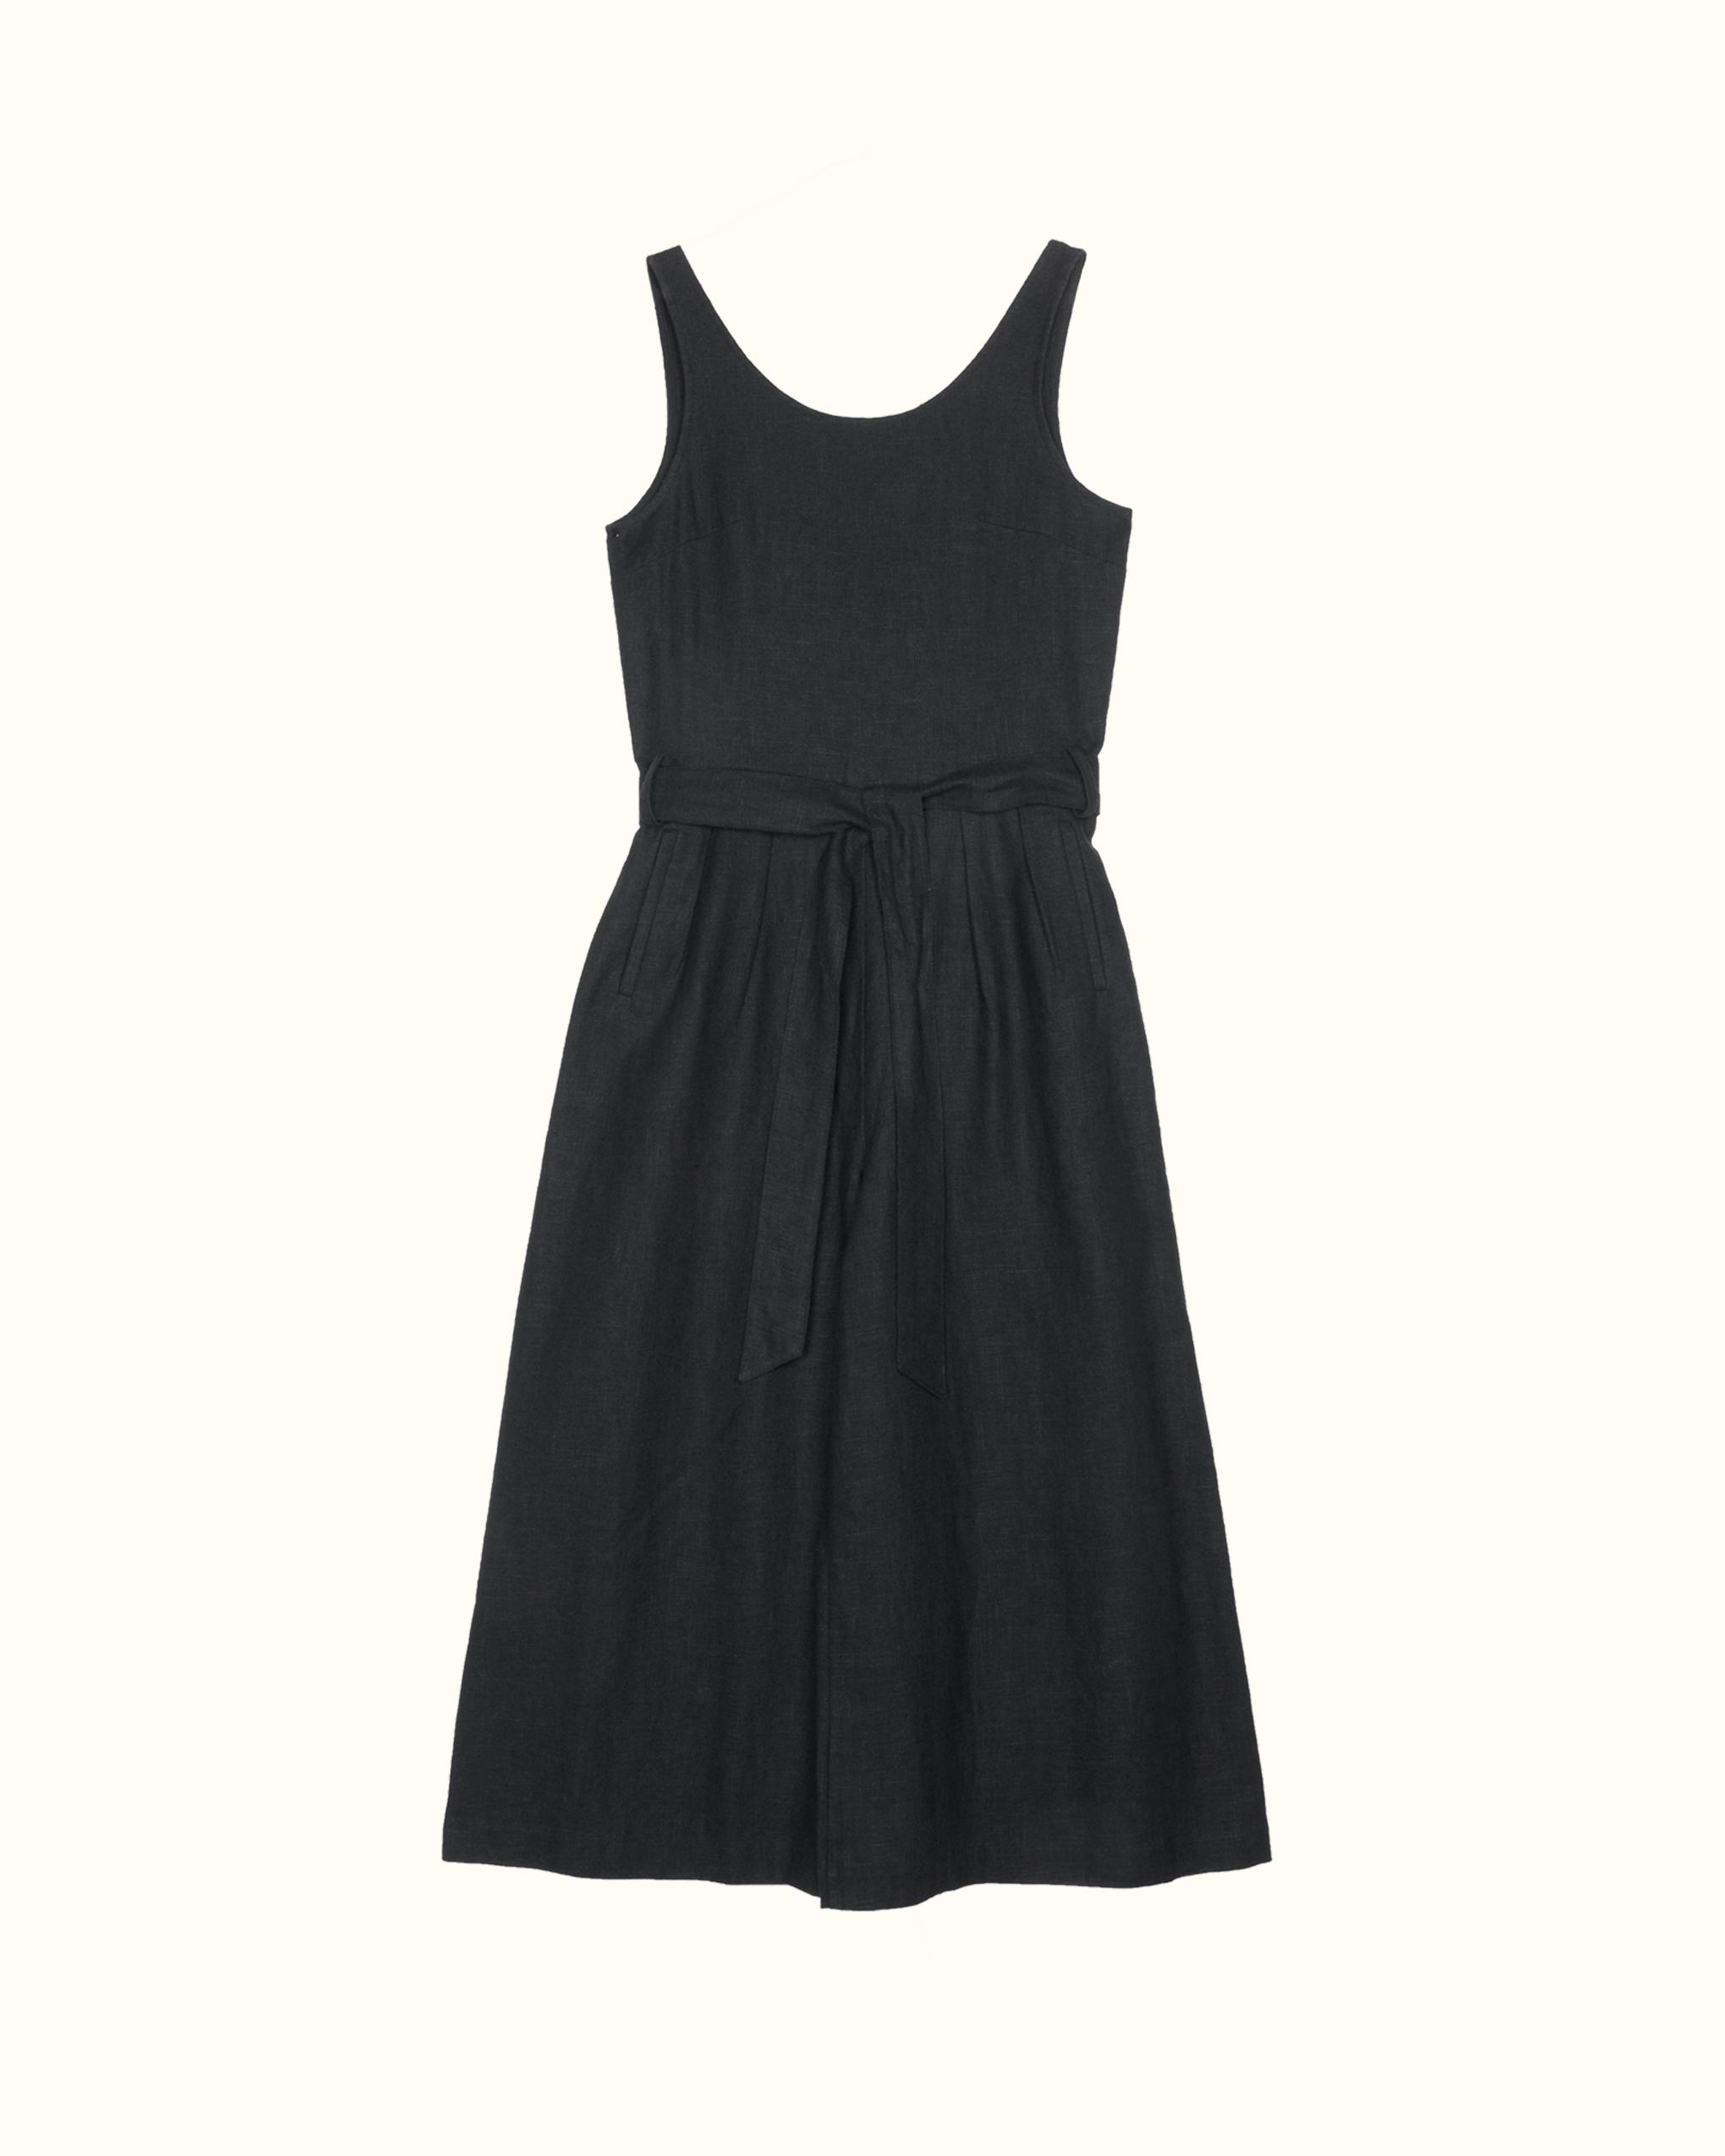 A black sleeveless scoop back linen jumpsuit.